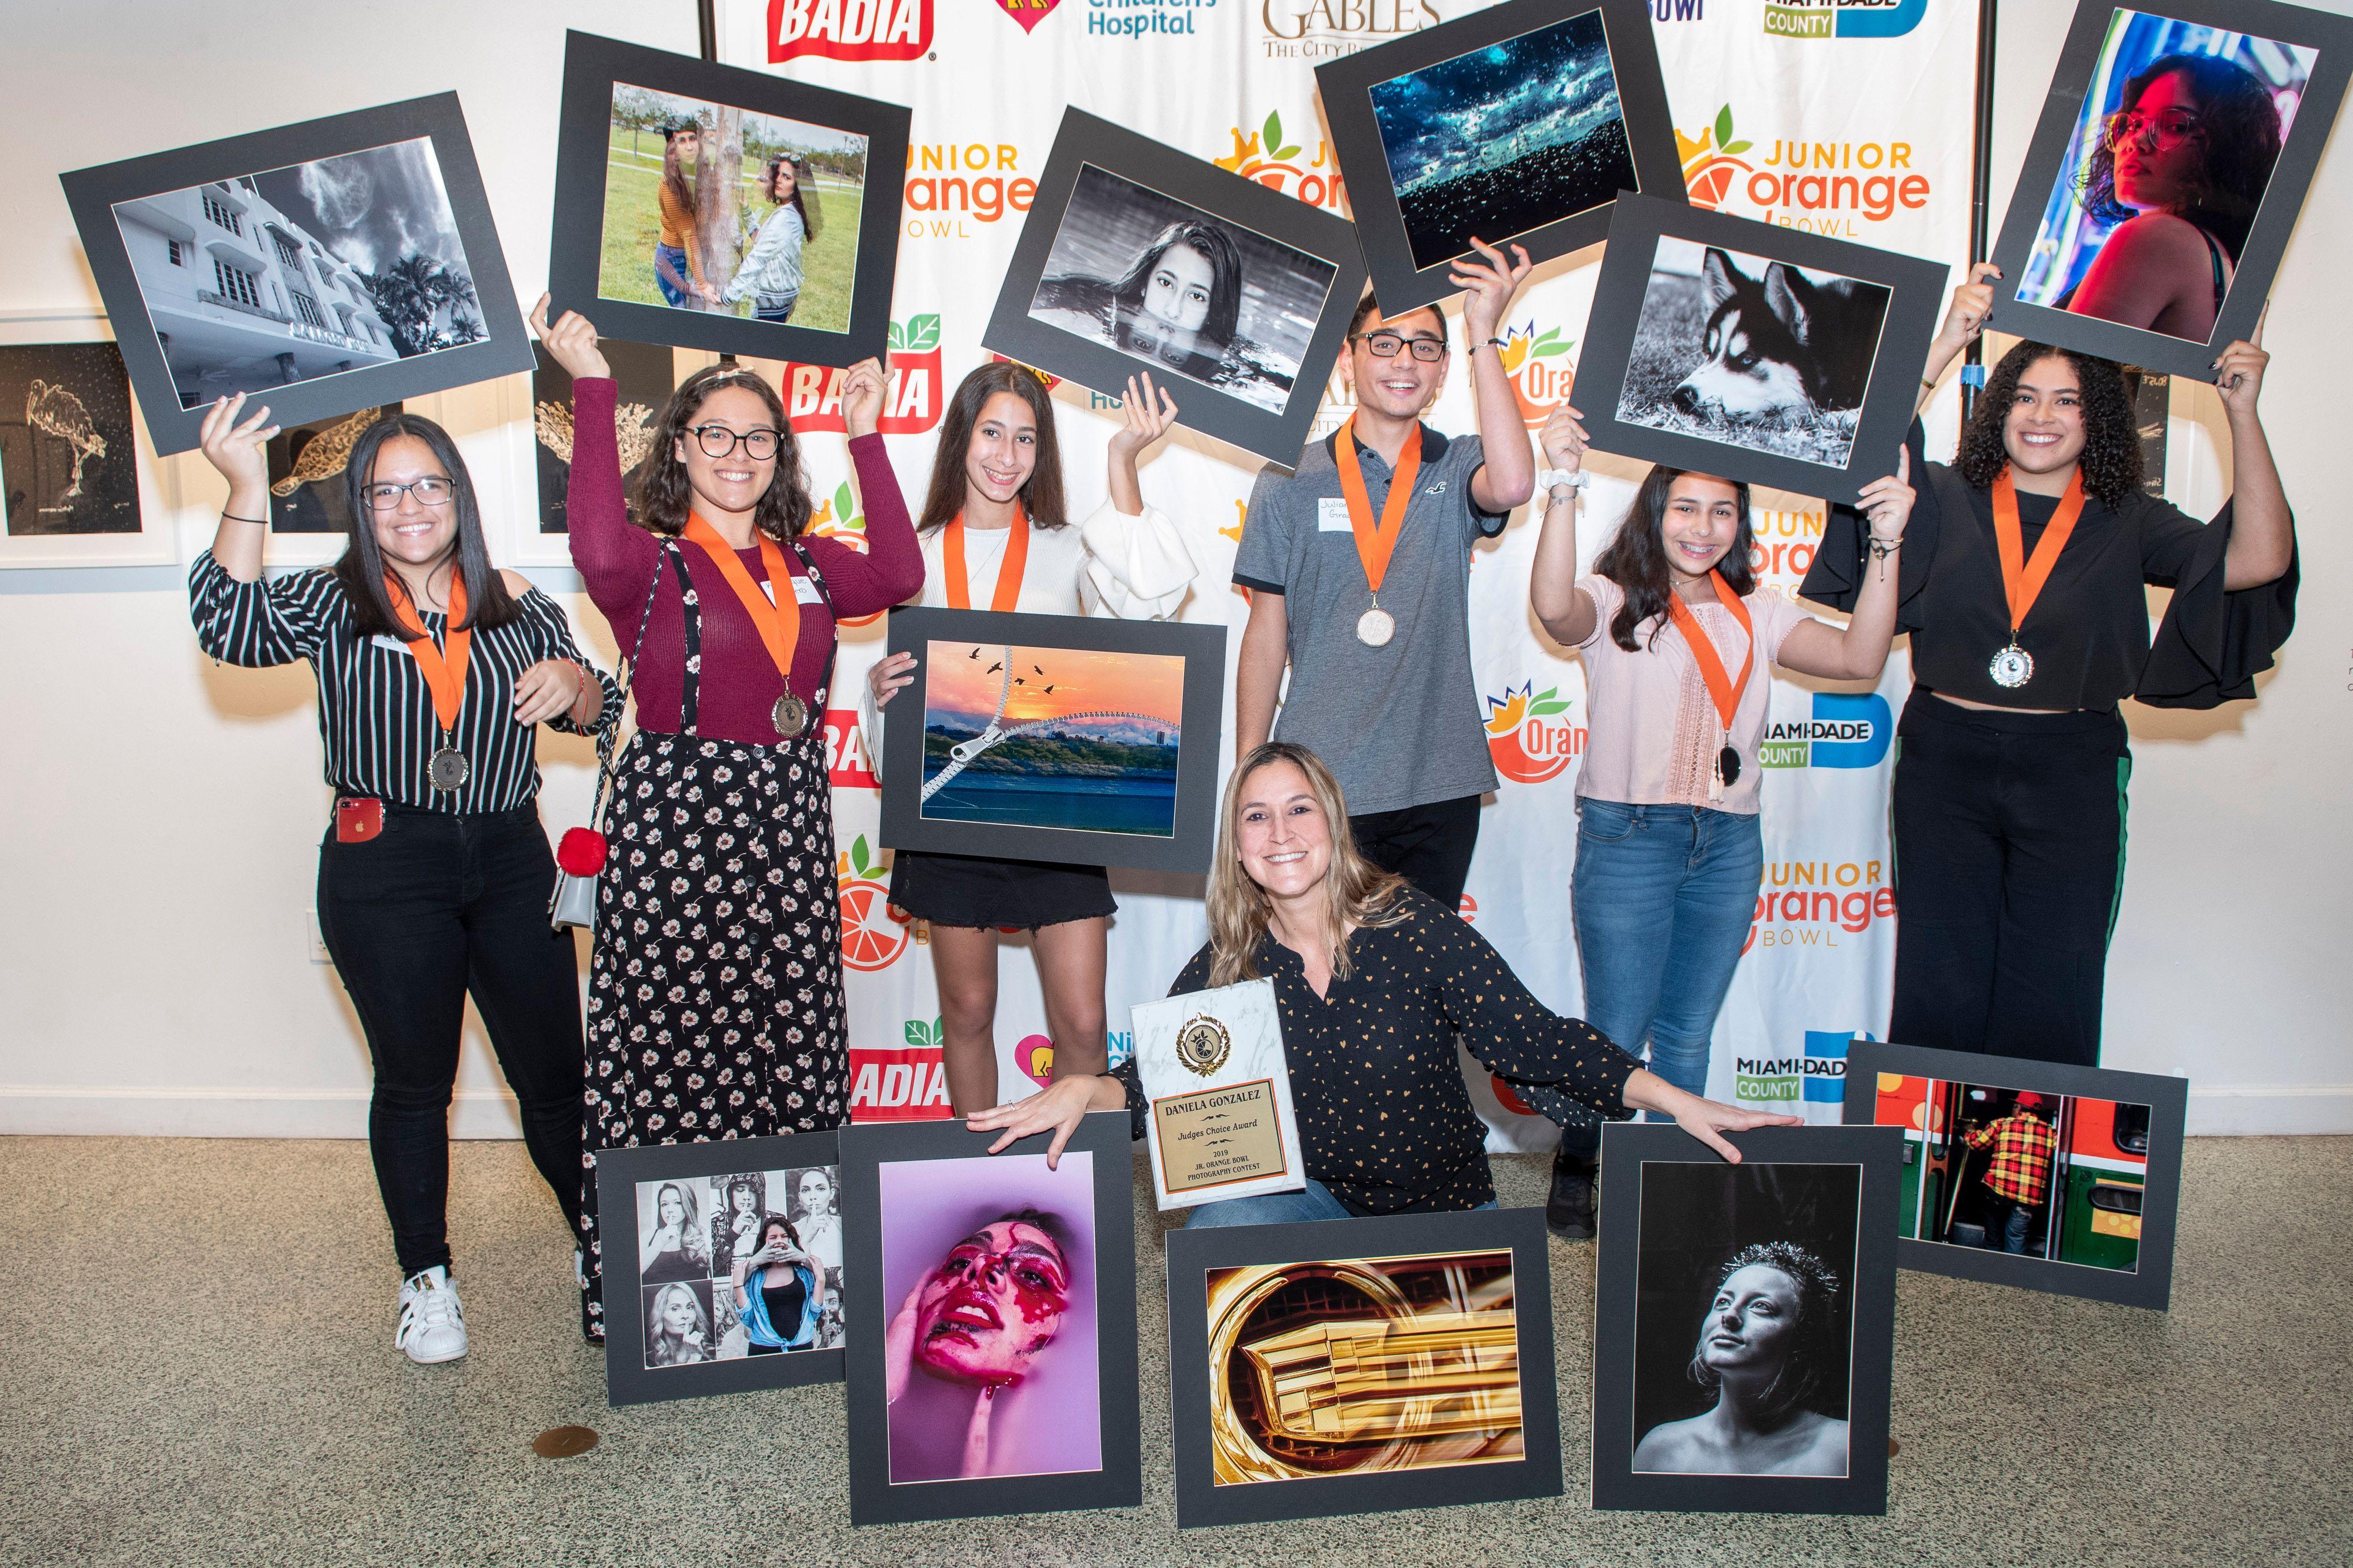 Junior Orange Bowl Photography Competition Awards Ceremony